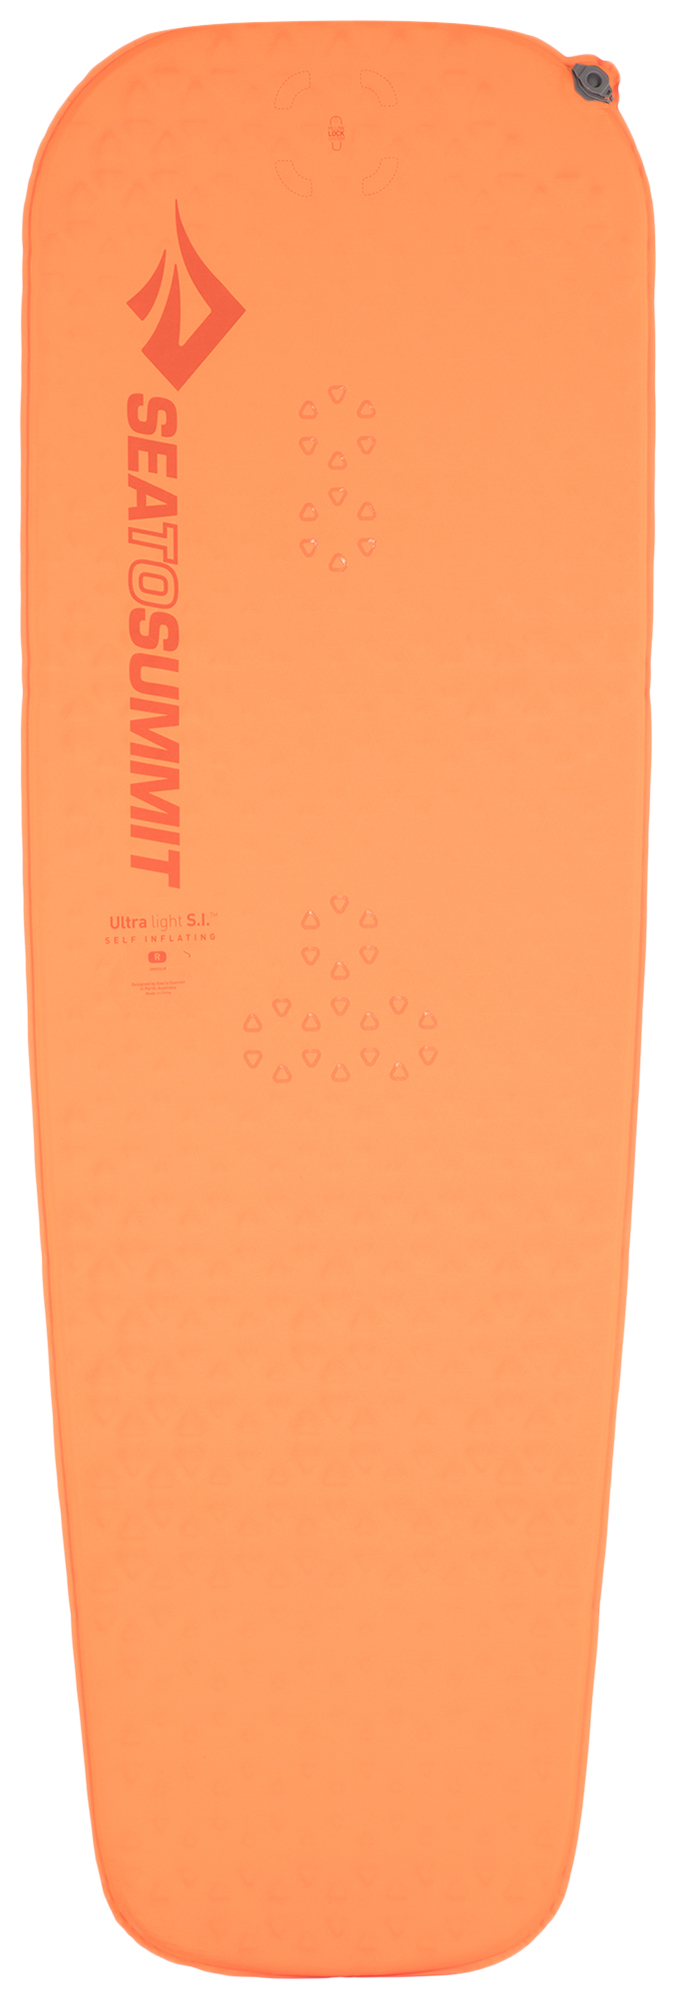 SEA TO SUMMIT Коврик самонадувающийся SEA TO SUMMIT UltraLight Self Inflating Mat Regular комплектующие для спортивных сумок sea to summit 56928afrb25spp 2015 afrb25srpp